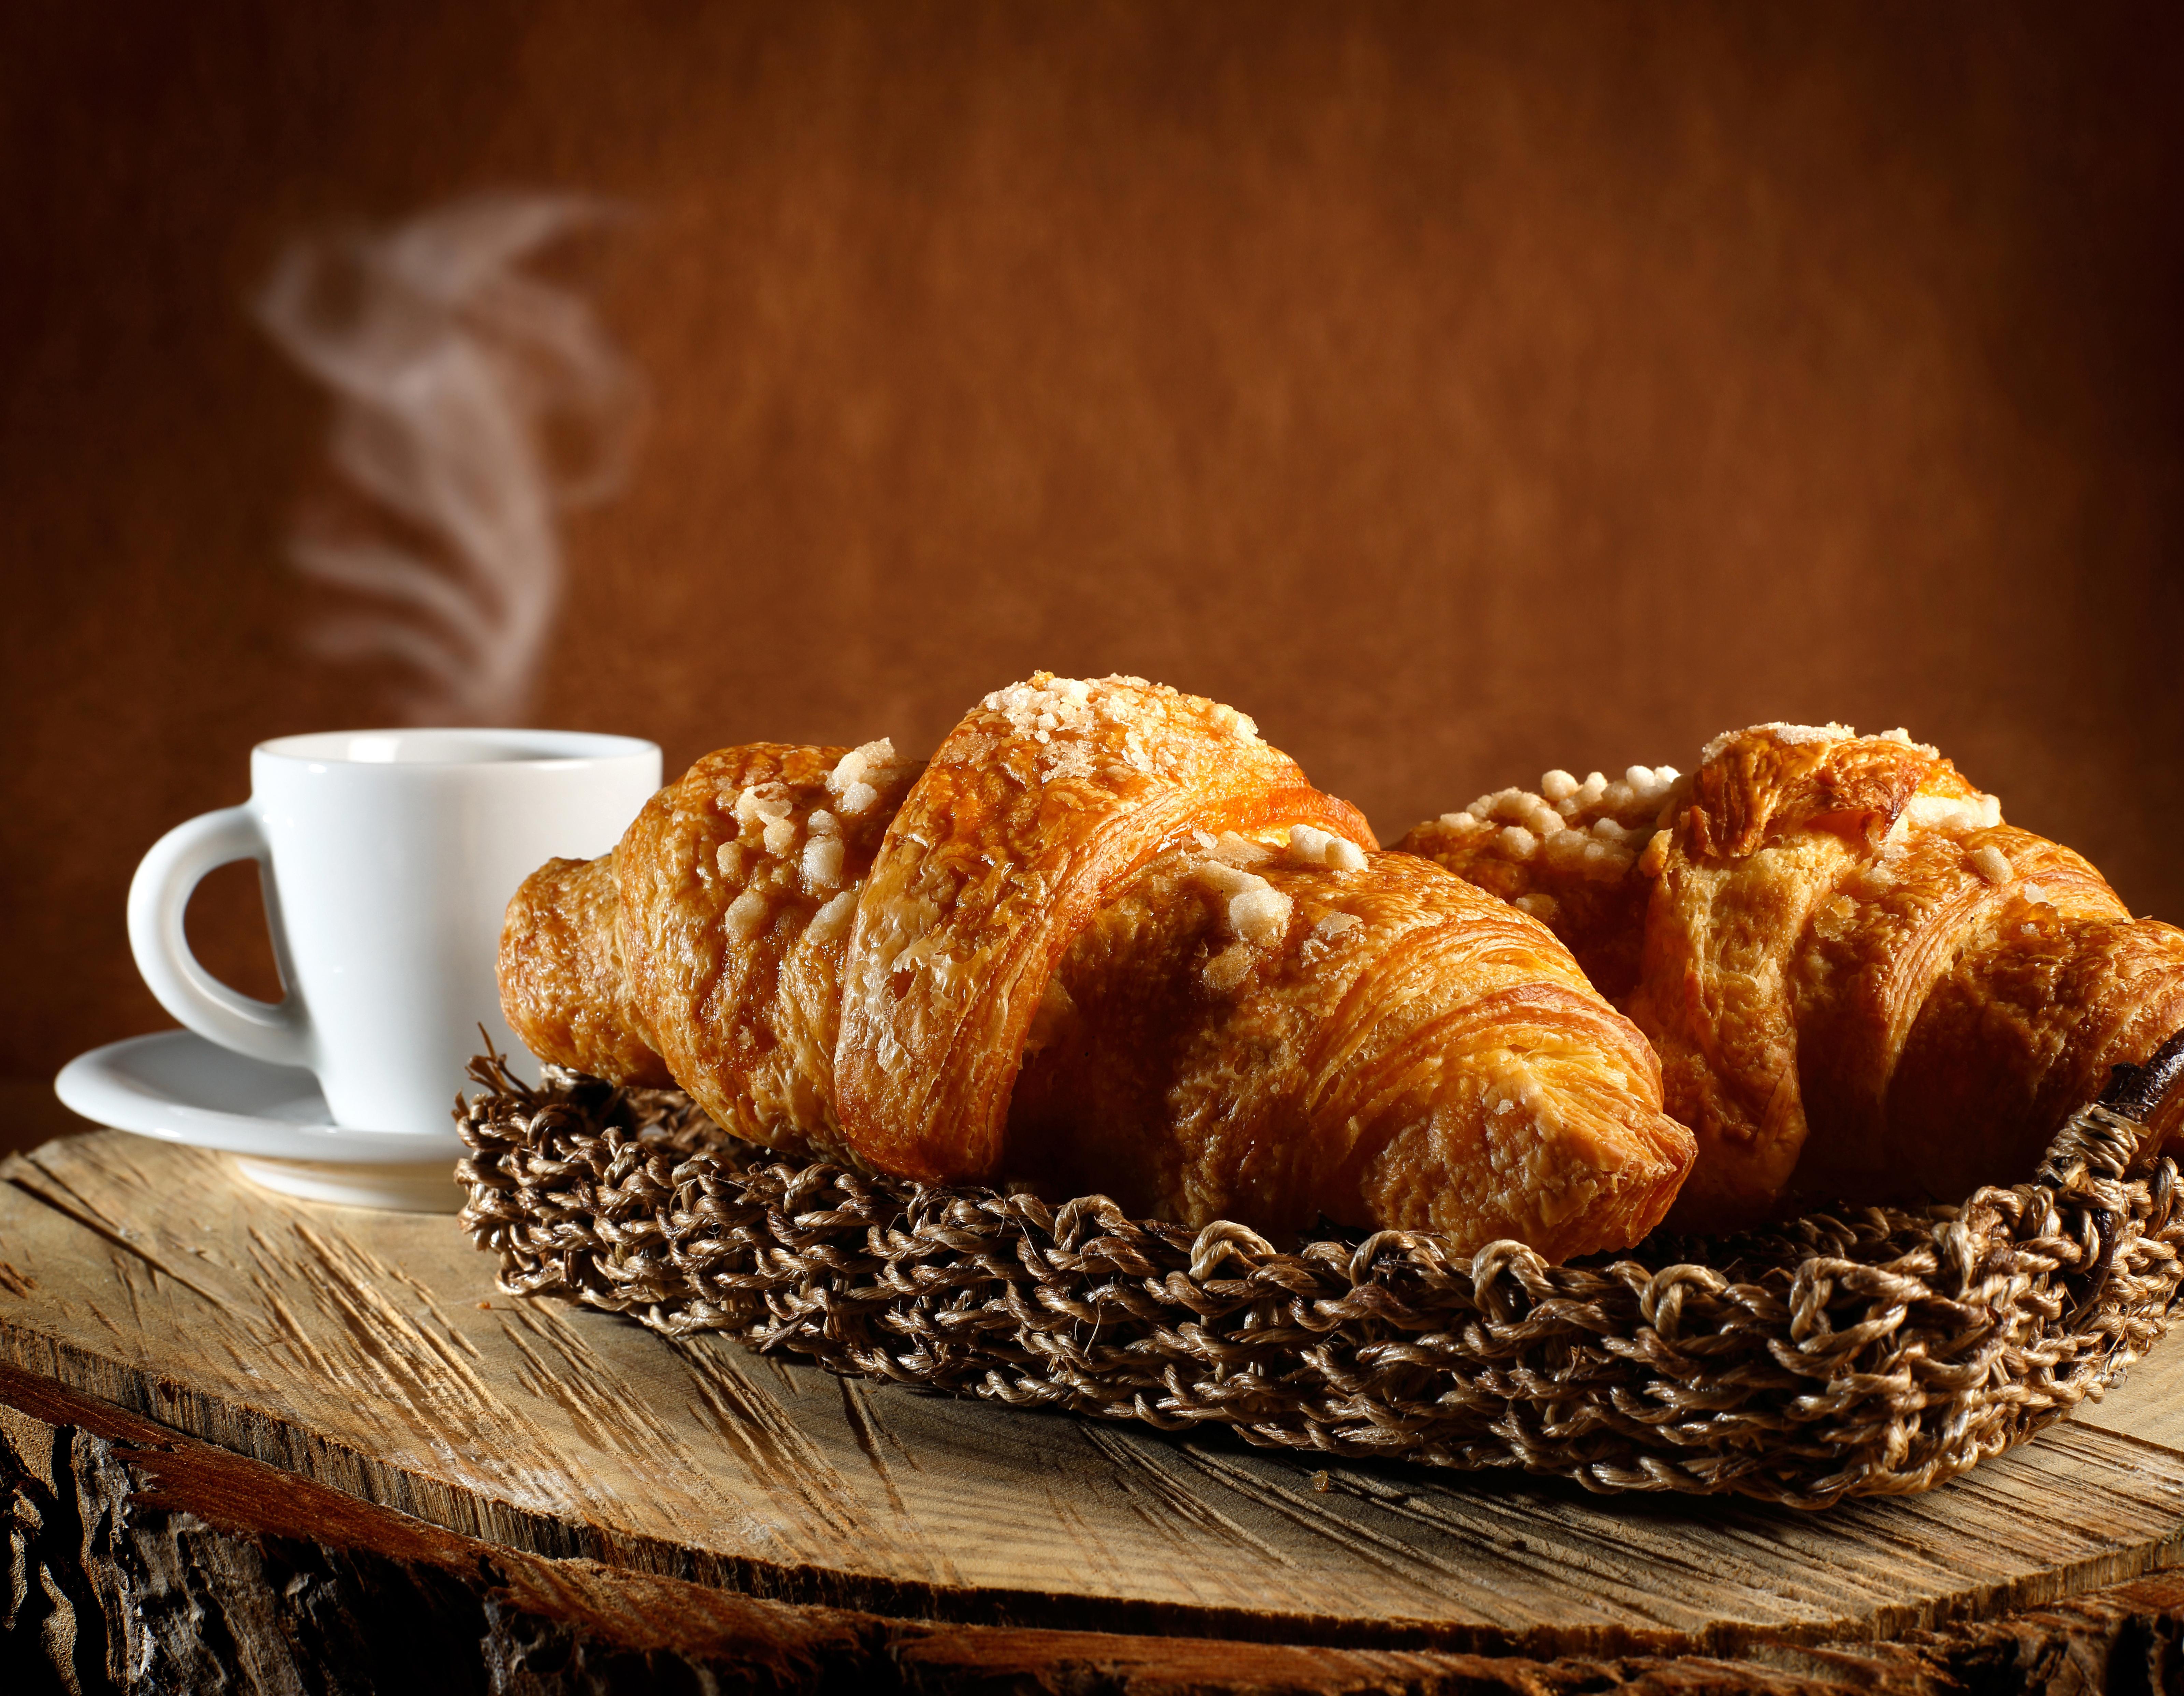 еда круасаны кофе повидло варенье food croissants coffee jam бесплатно